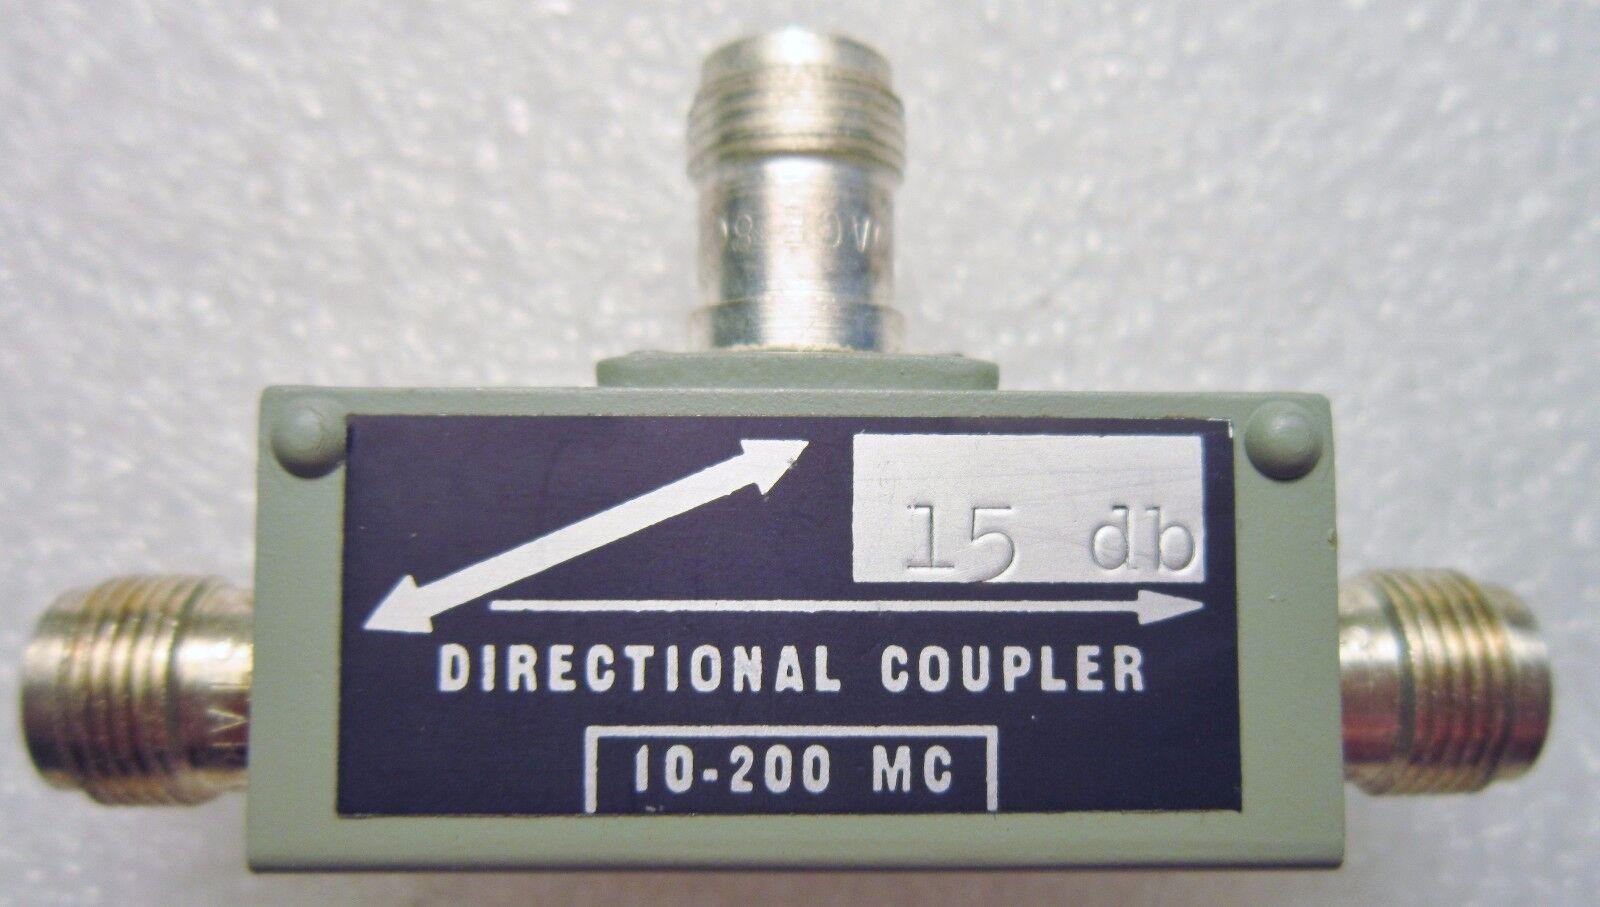 UR-1-15 MERRIMAC DIRECTIONAL COUPLER 15DB 10-200MC